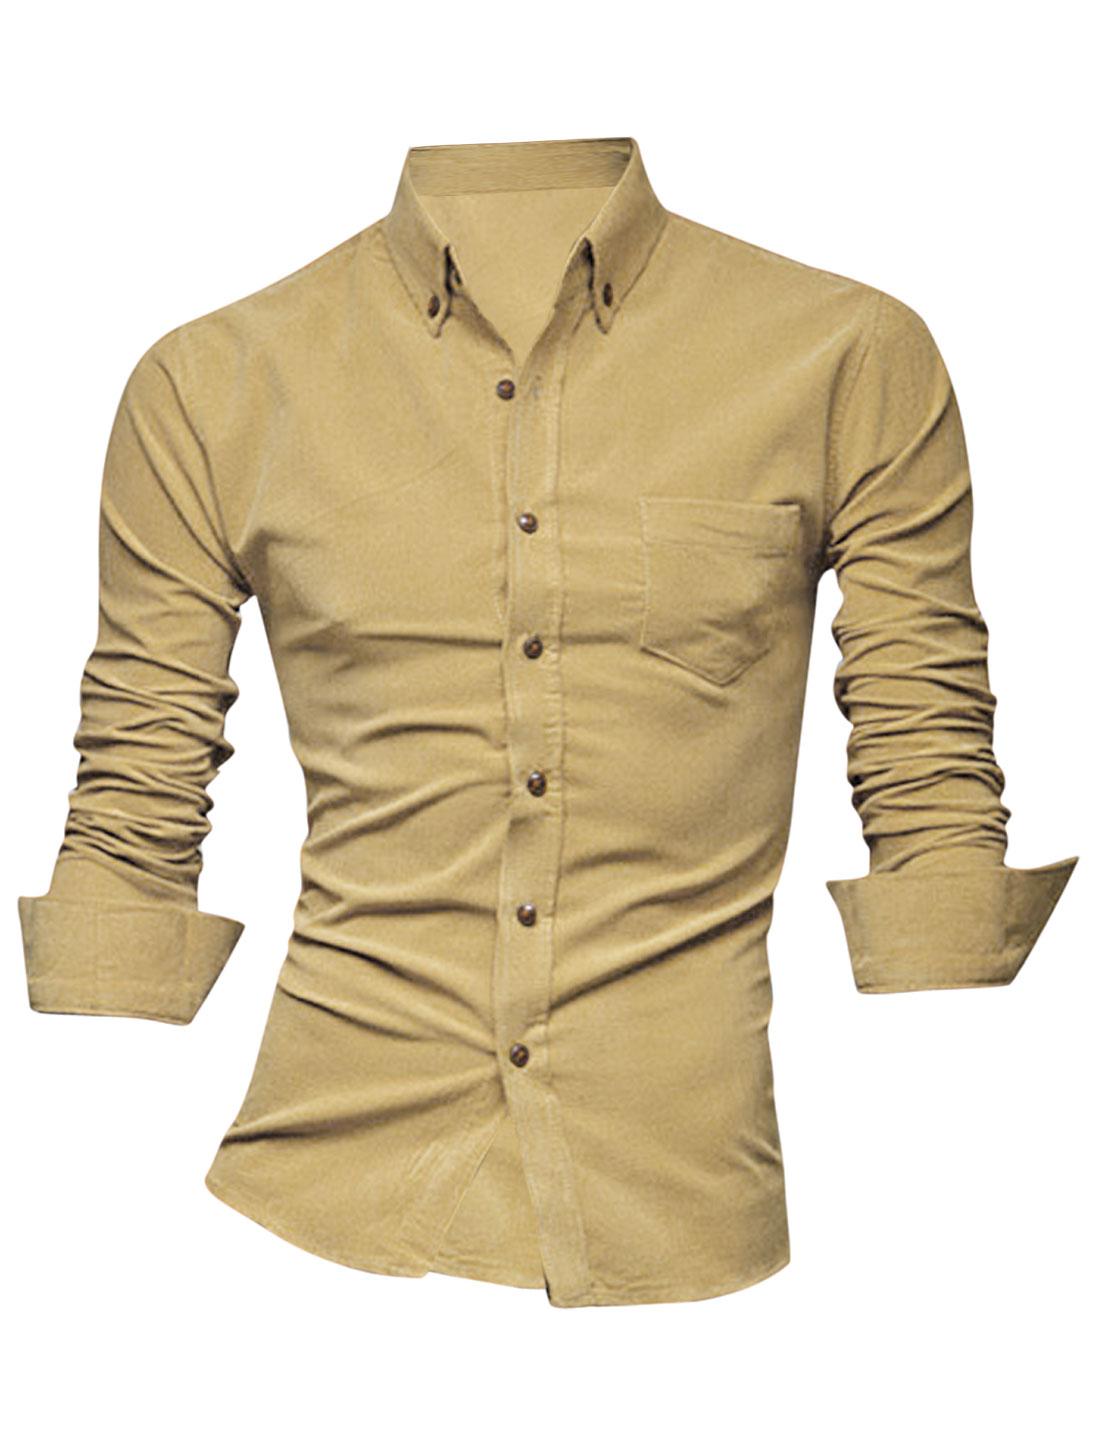 Men Point Collar Button Closure Front Casual Shirt Khaki M